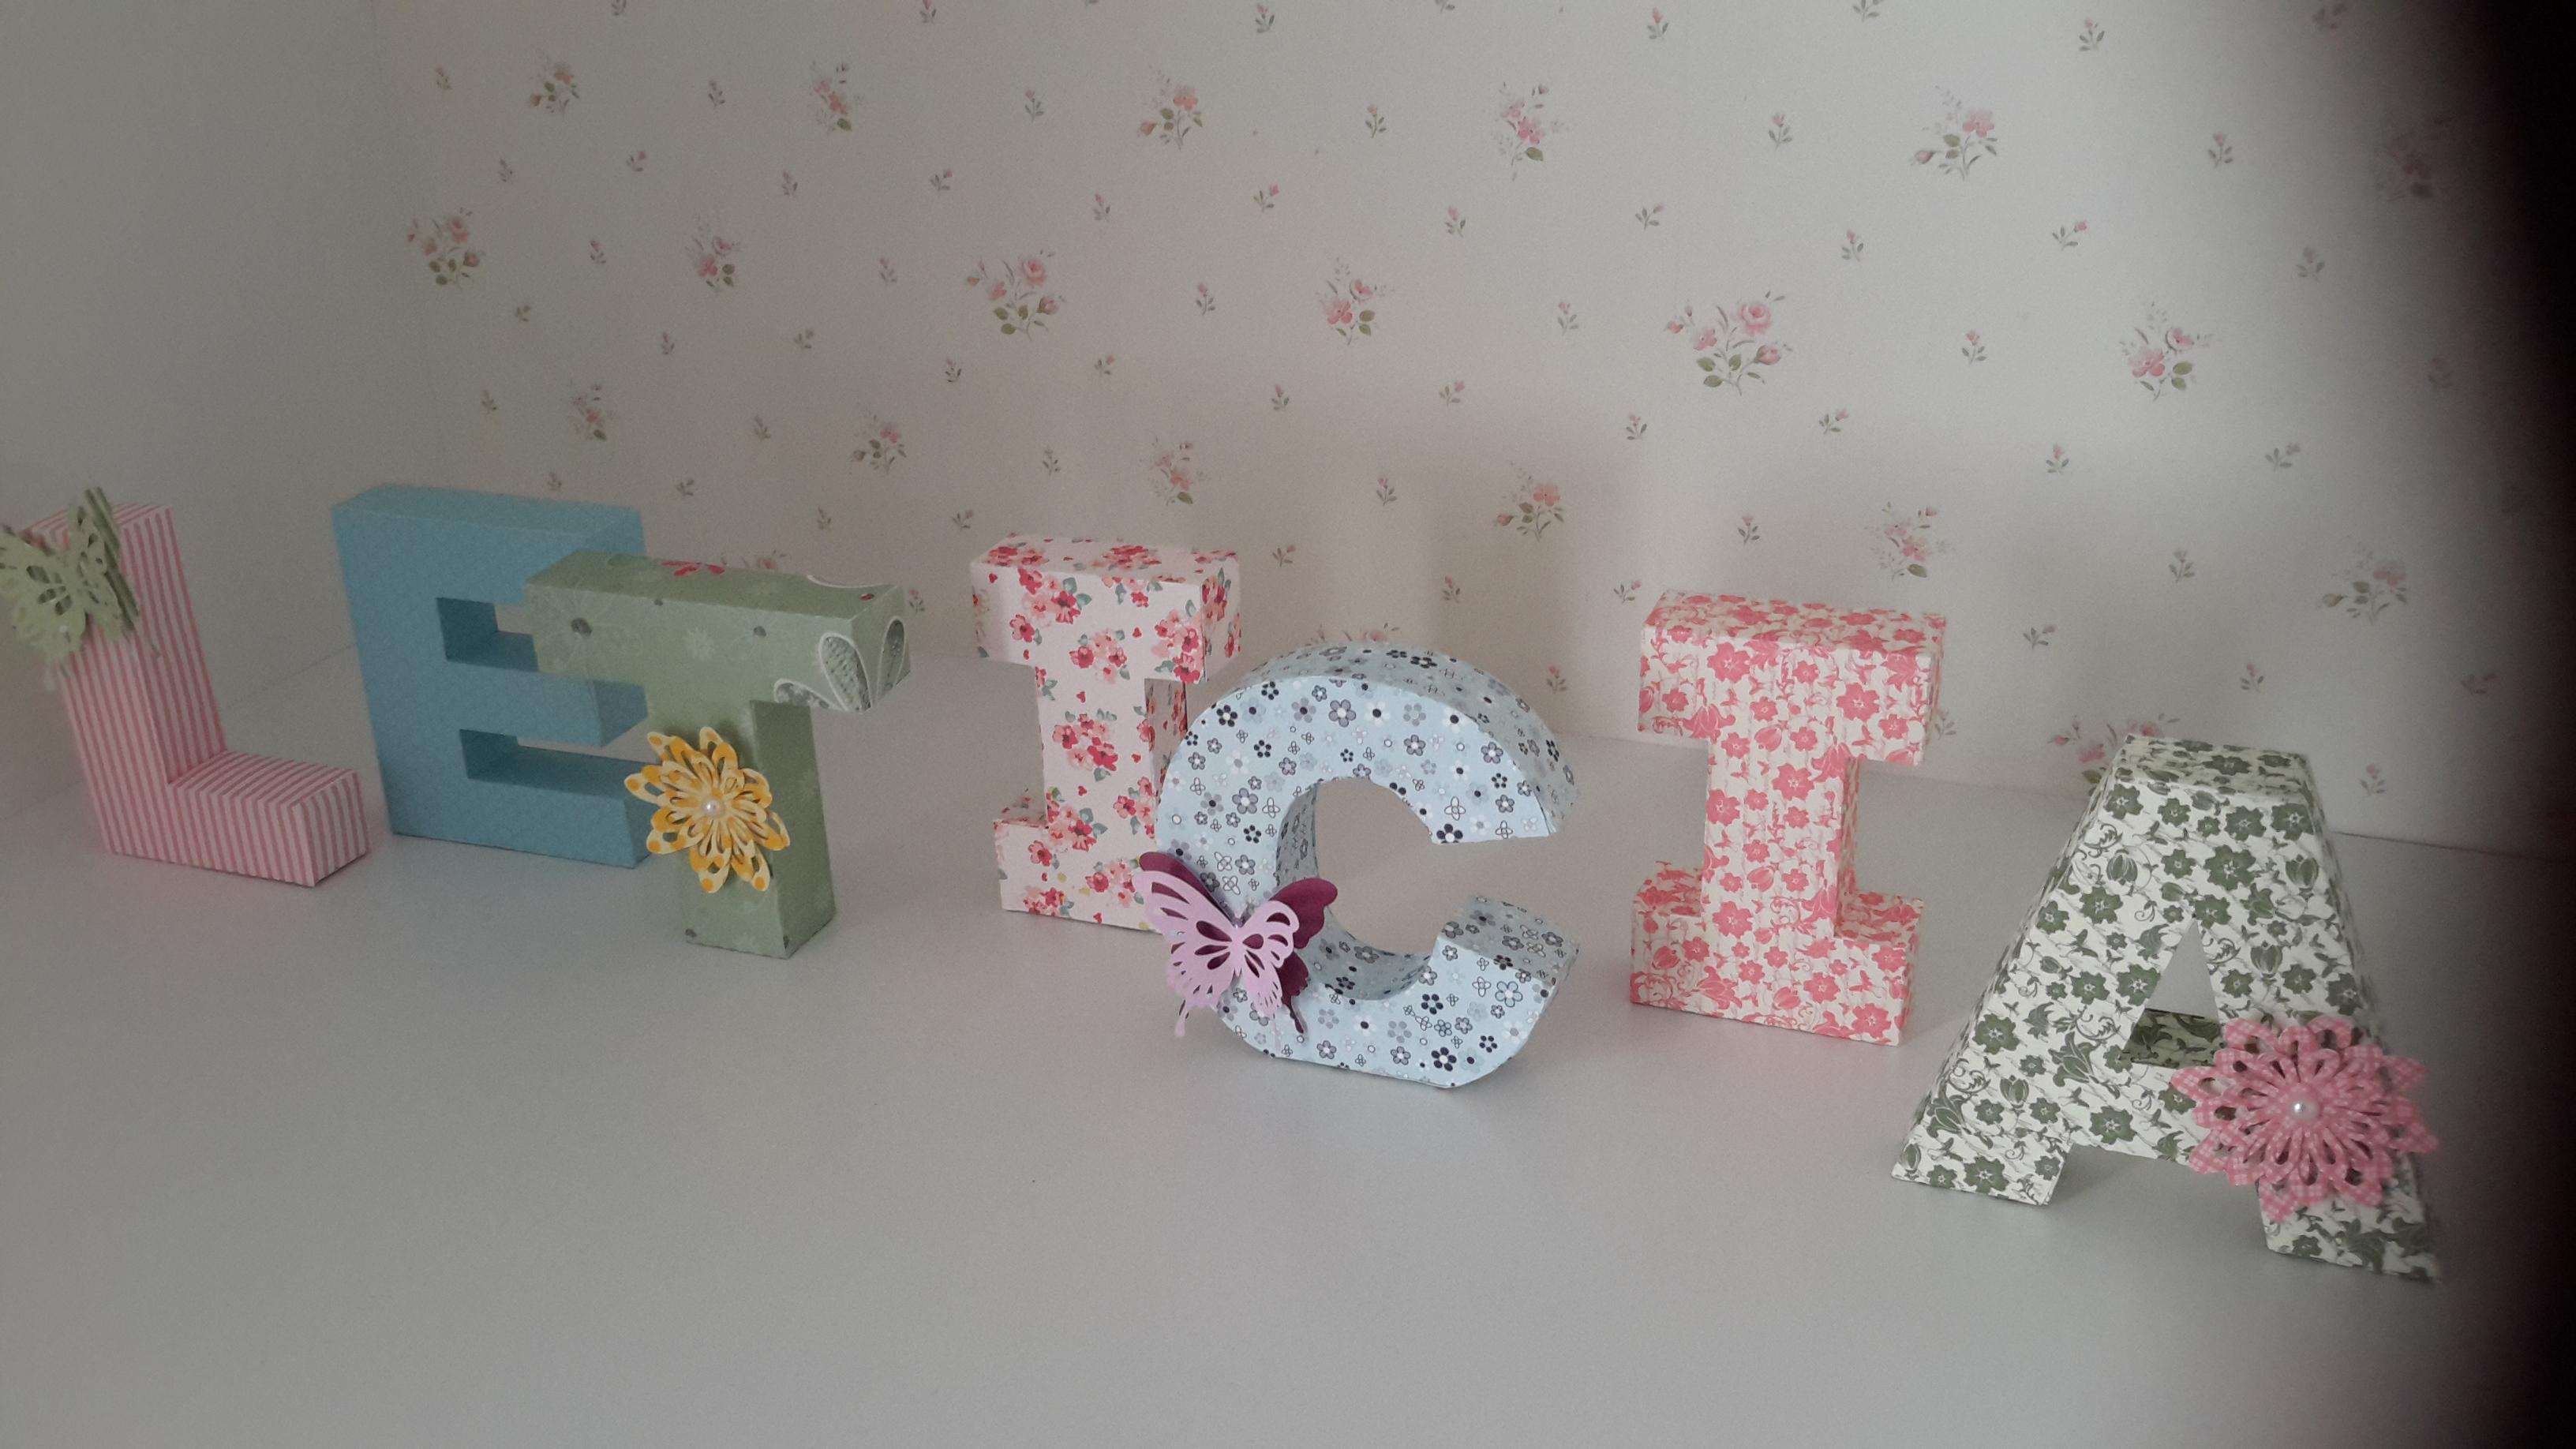 flores do jardim letra : flores do jardim letra:letras-3d-flores-e-borboletas-letras-3d-borboletas